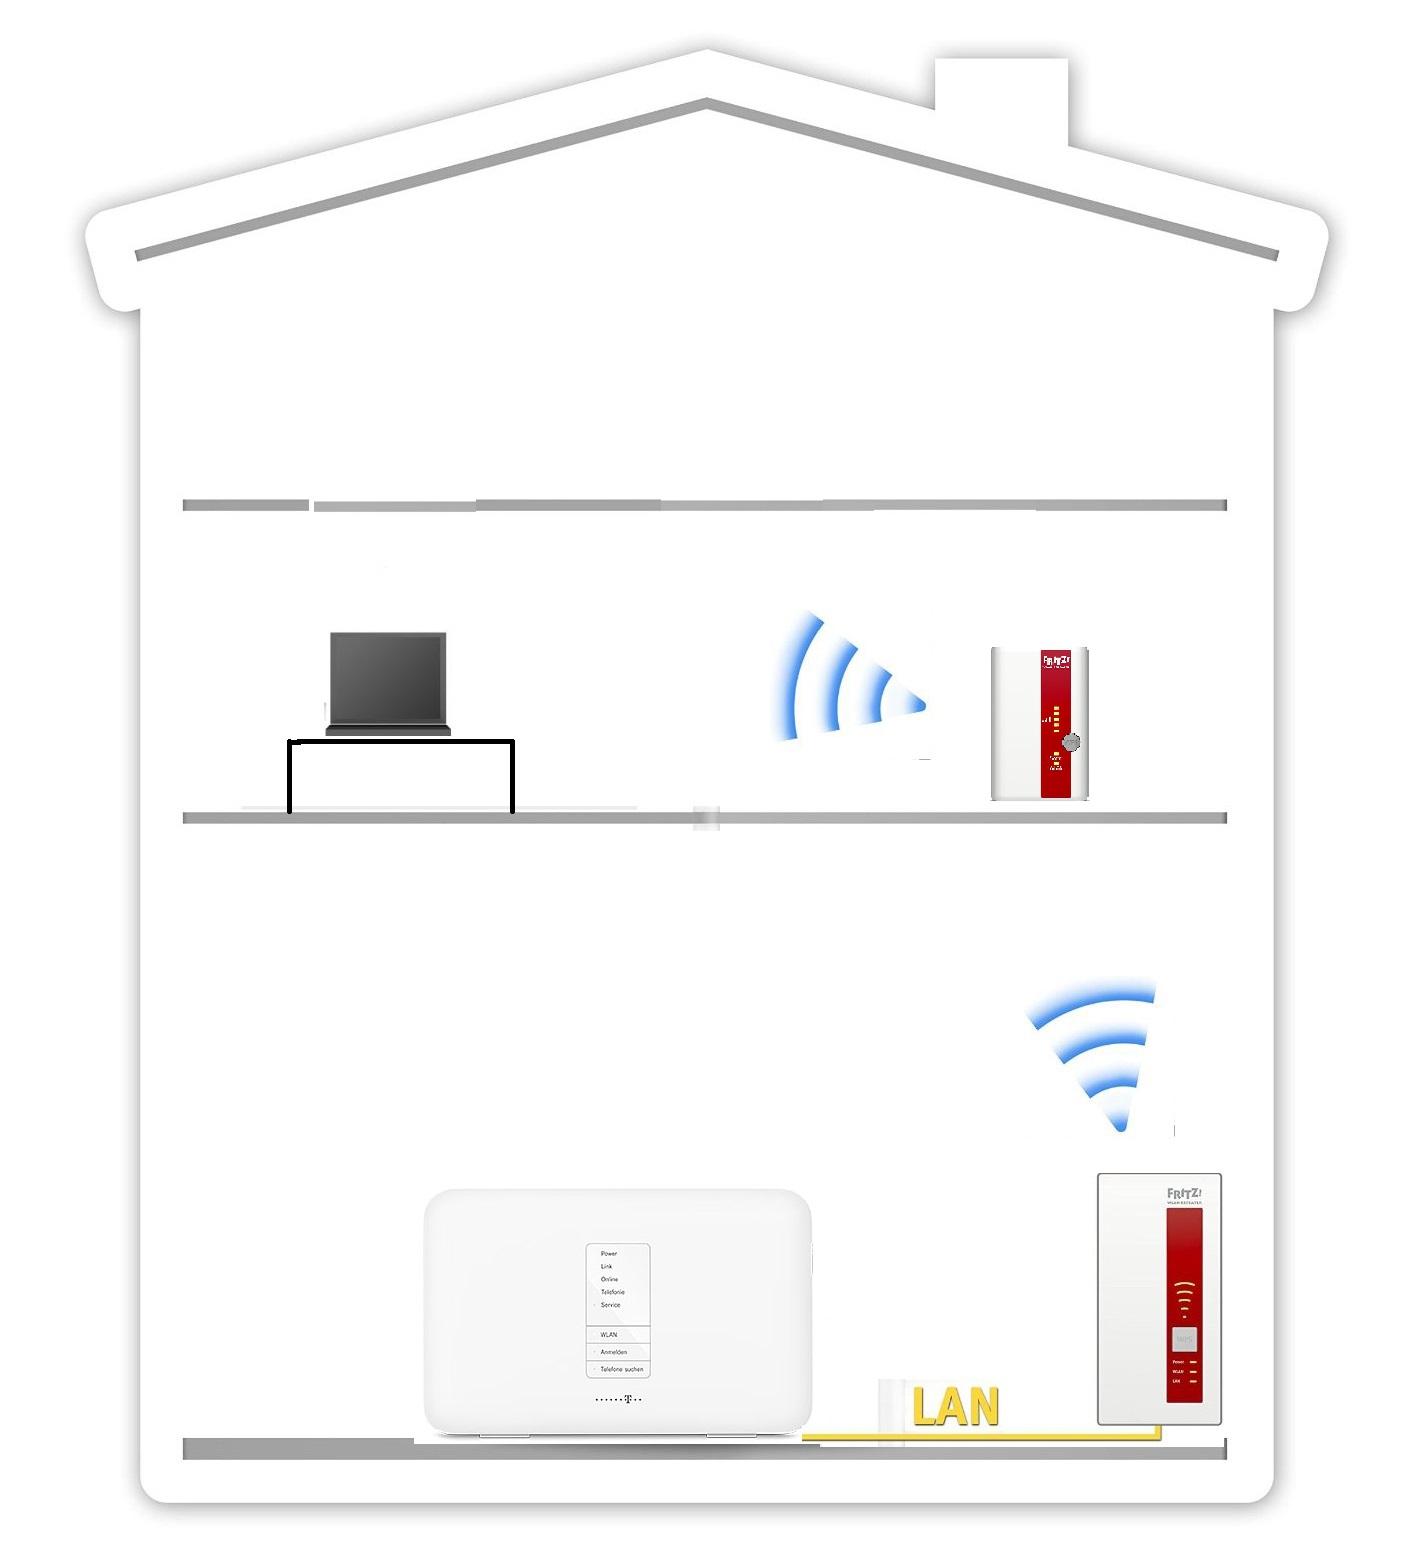 hp drucker mit fritz wlan repeater verbinden. Black Bedroom Furniture Sets. Home Design Ideas